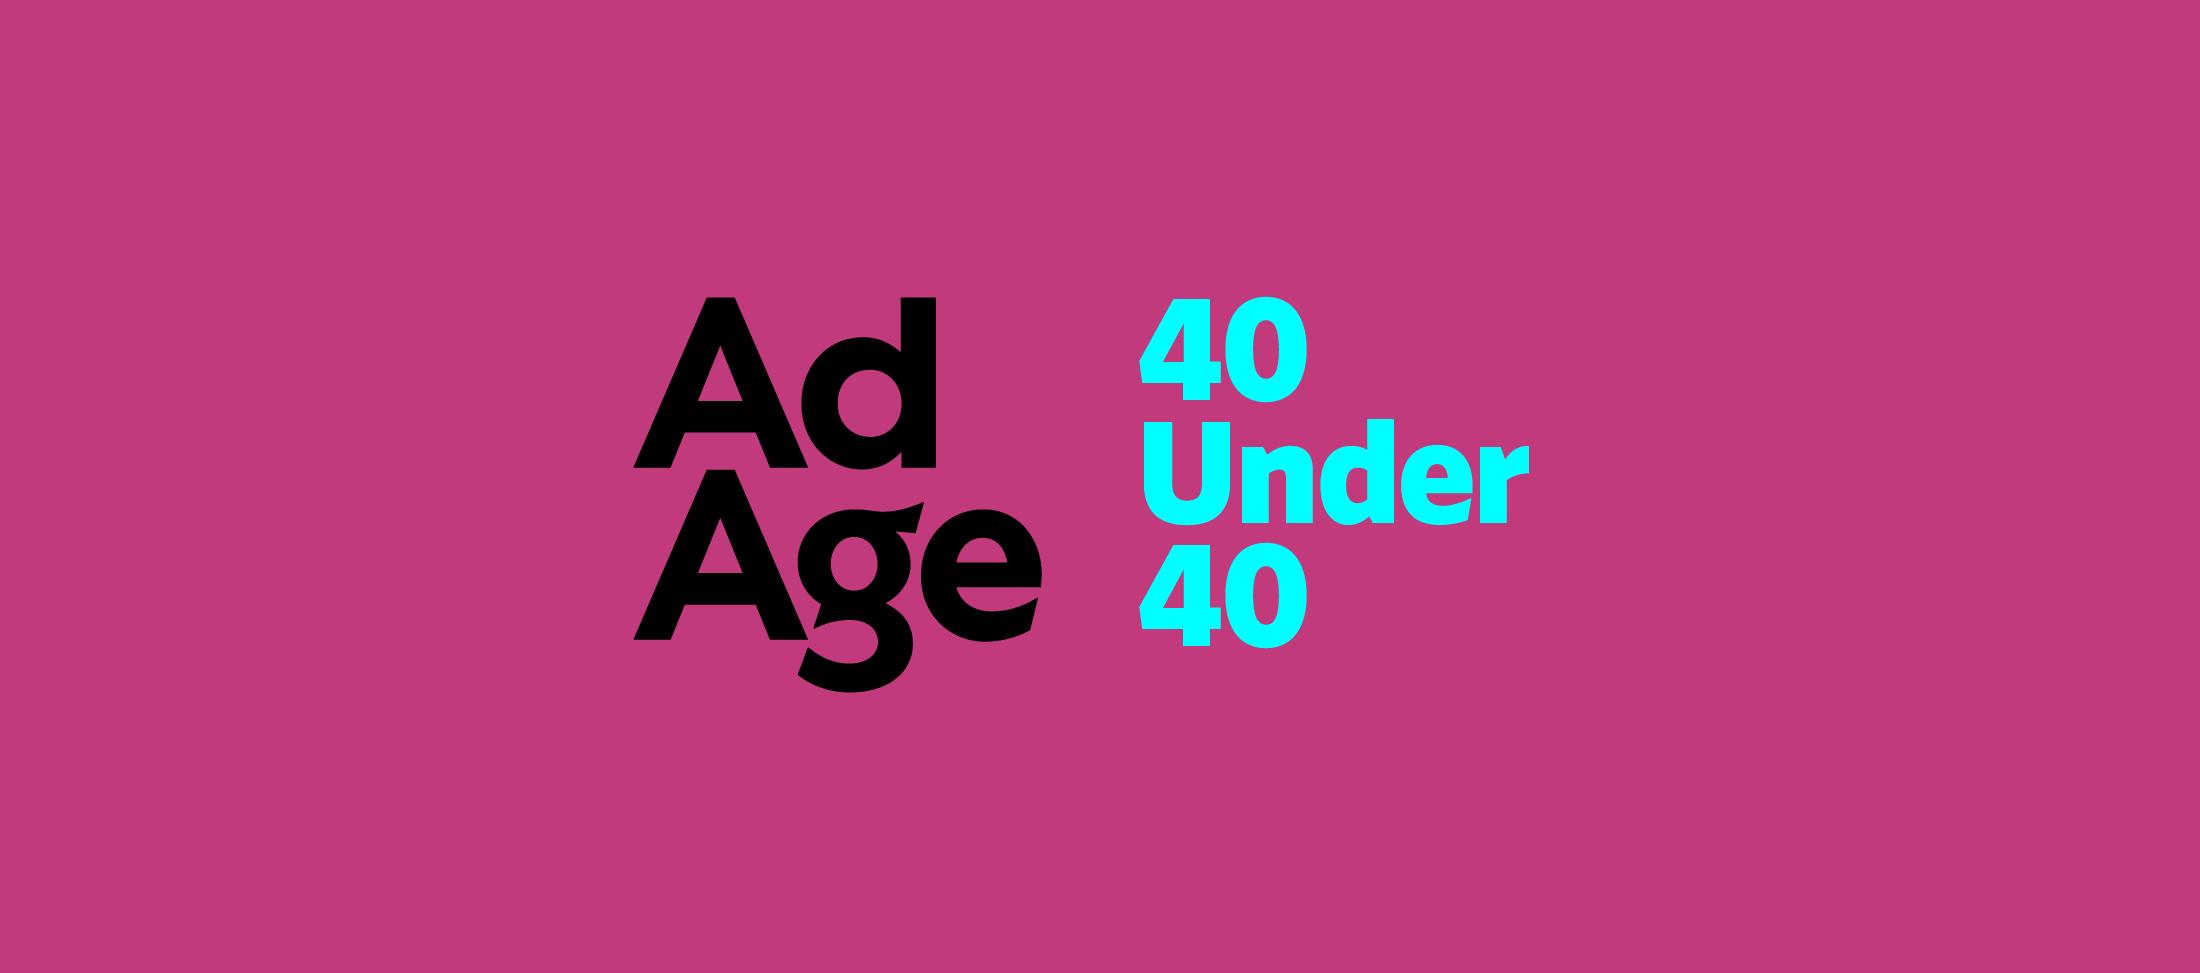 Ad Age 40 under 40